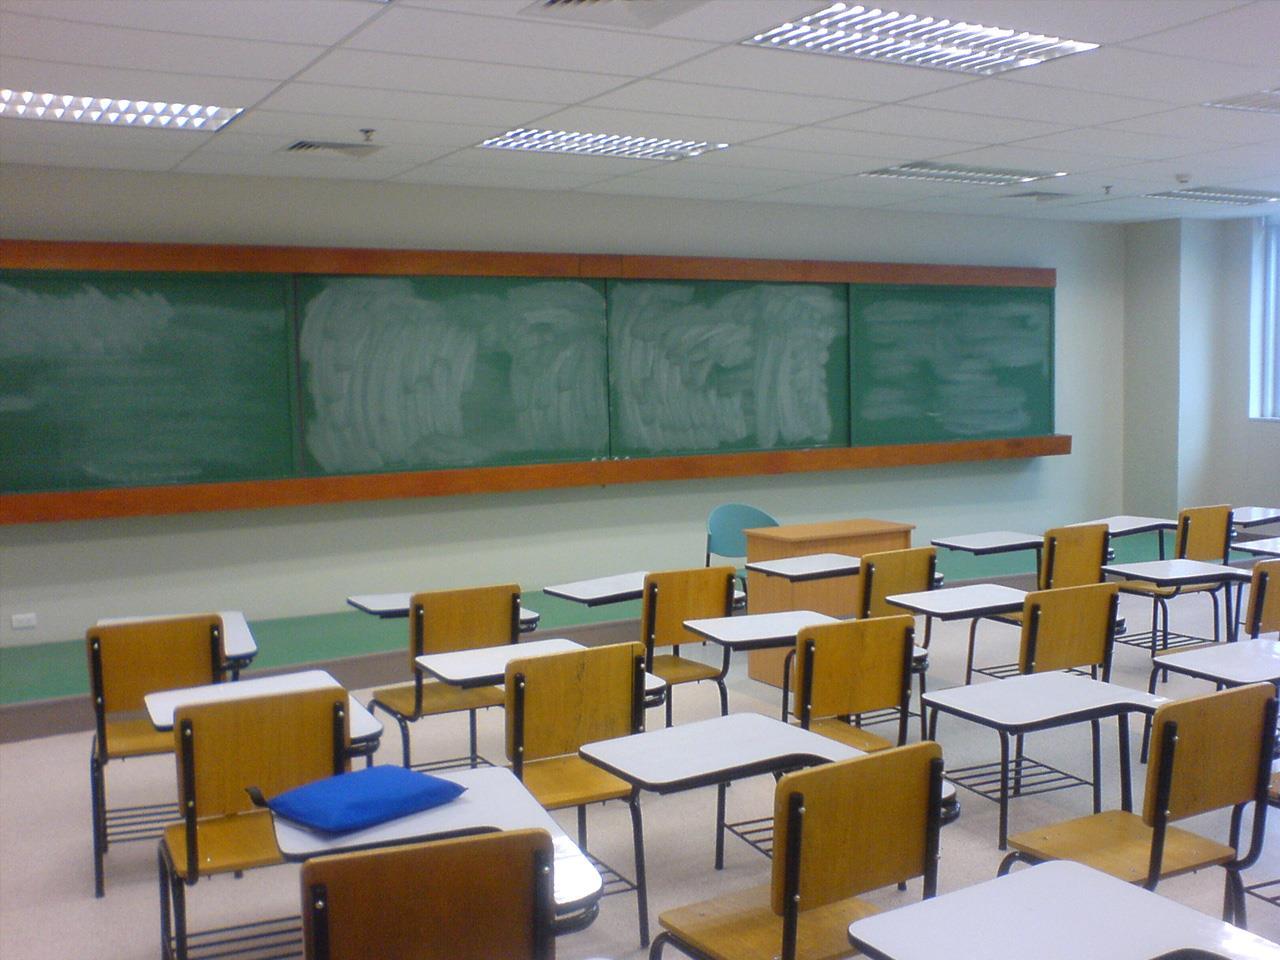 mgn-school-classroom-desks_312772